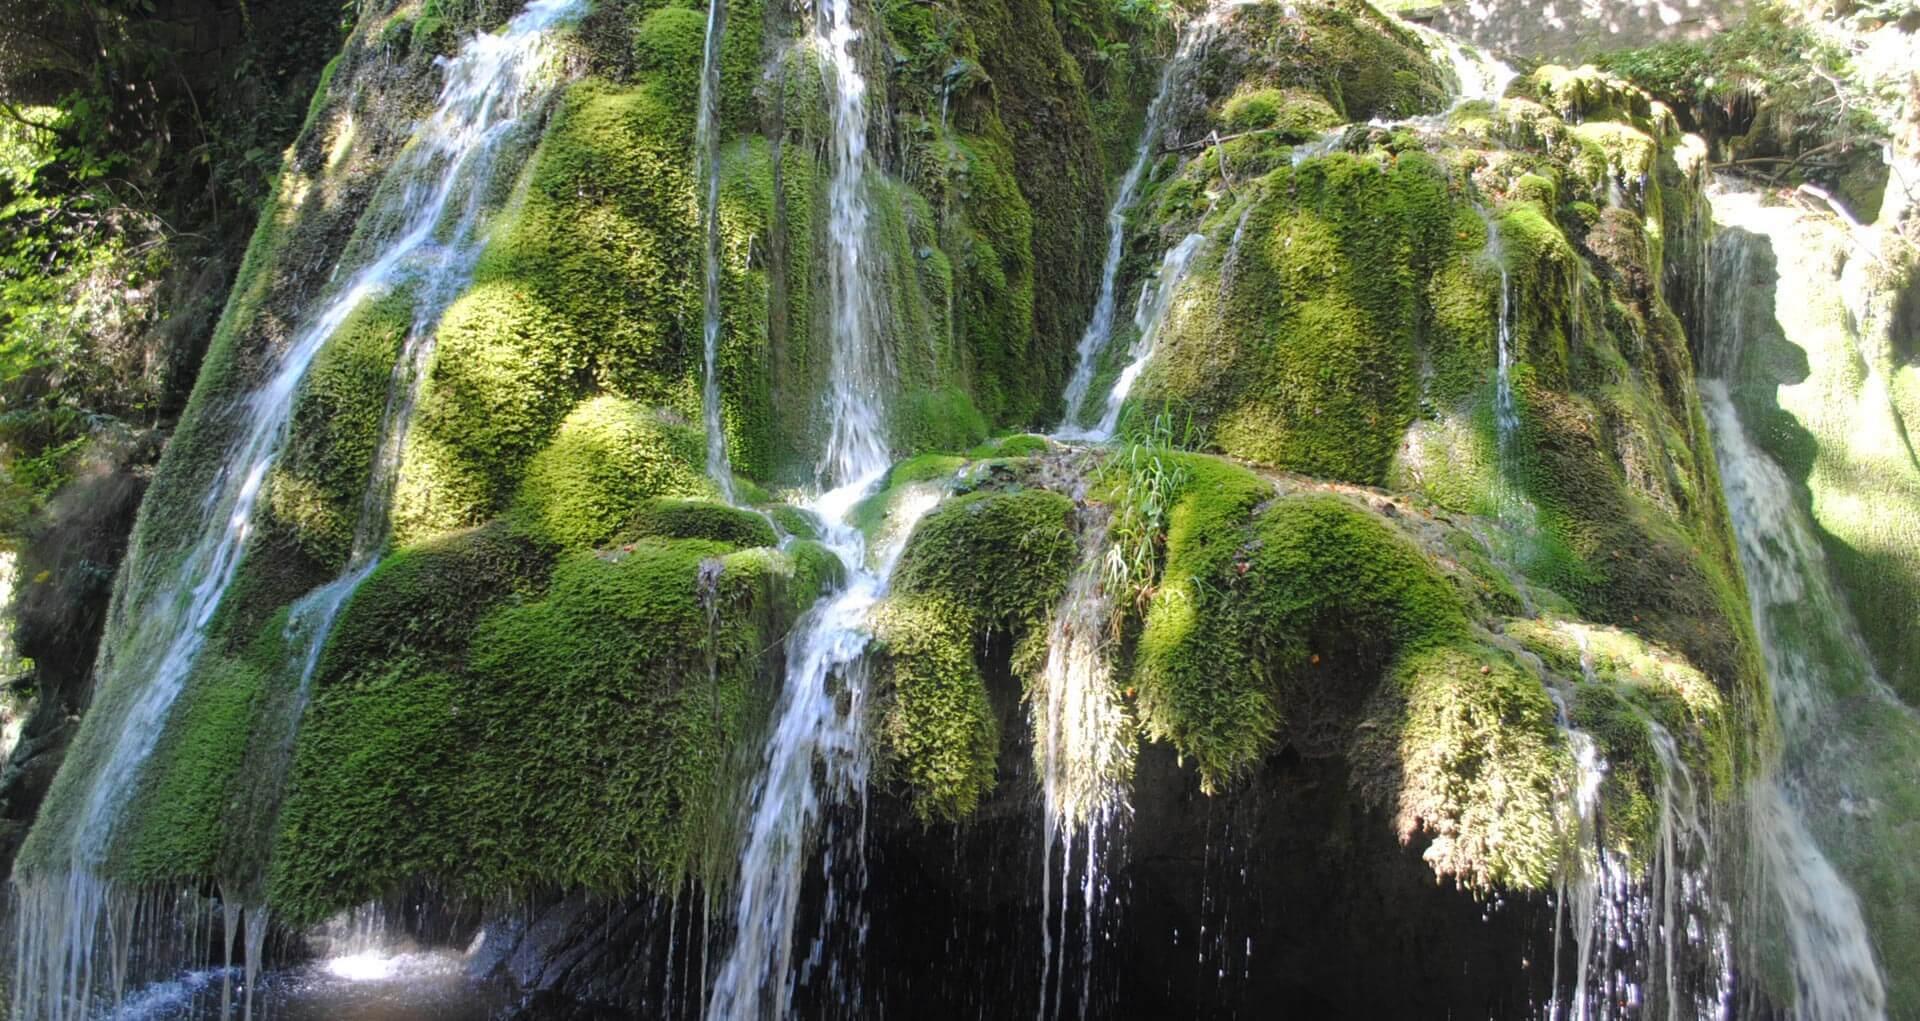 Oameni multumiti - excursii in natura, evenimente culturale